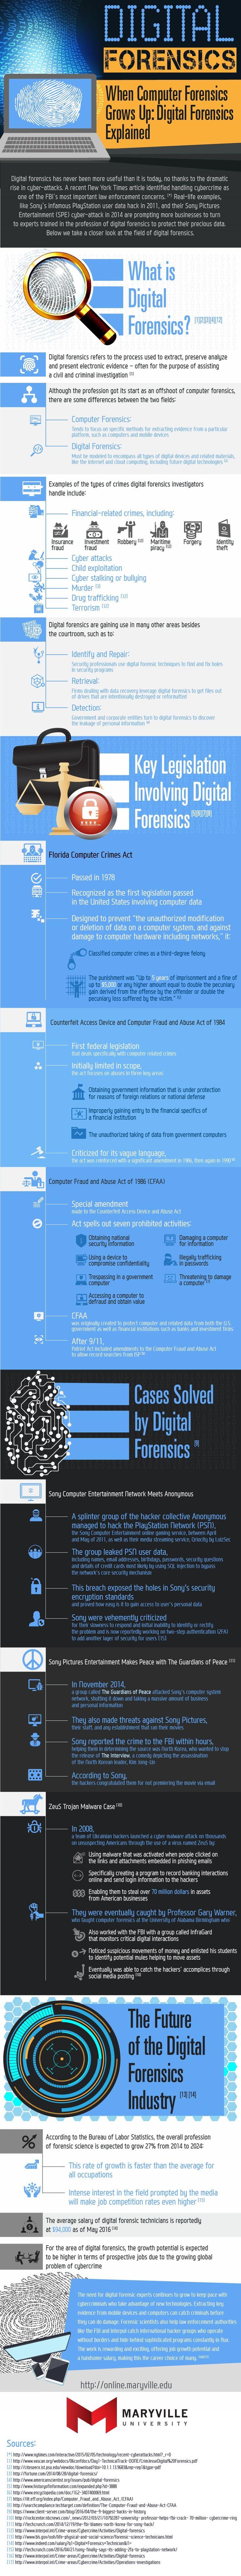 Digital Forensics #Infographic #Technology